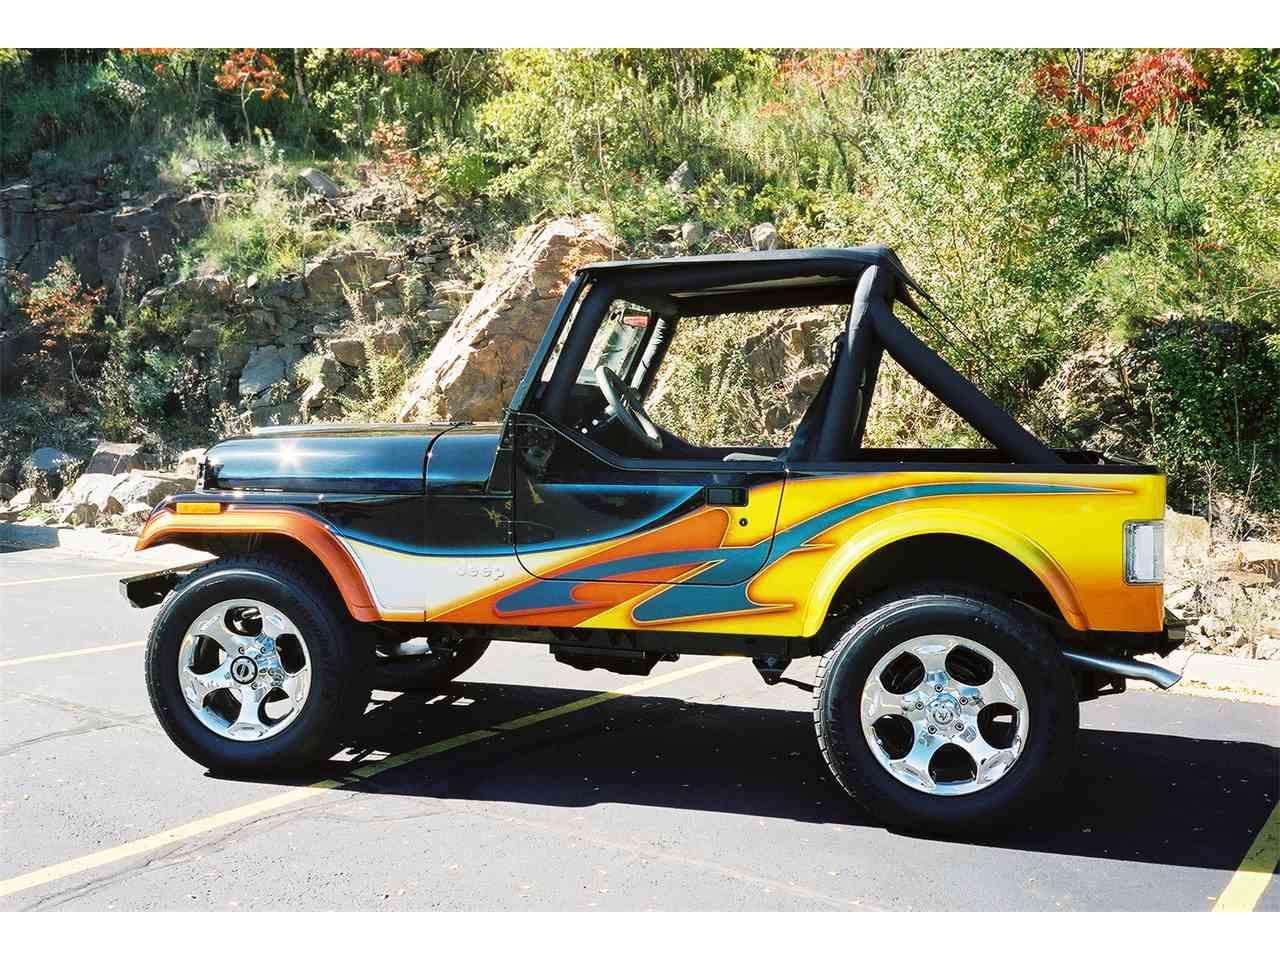 1983 Jeep Cj7 For Sale Classiccars Com Cc 966226